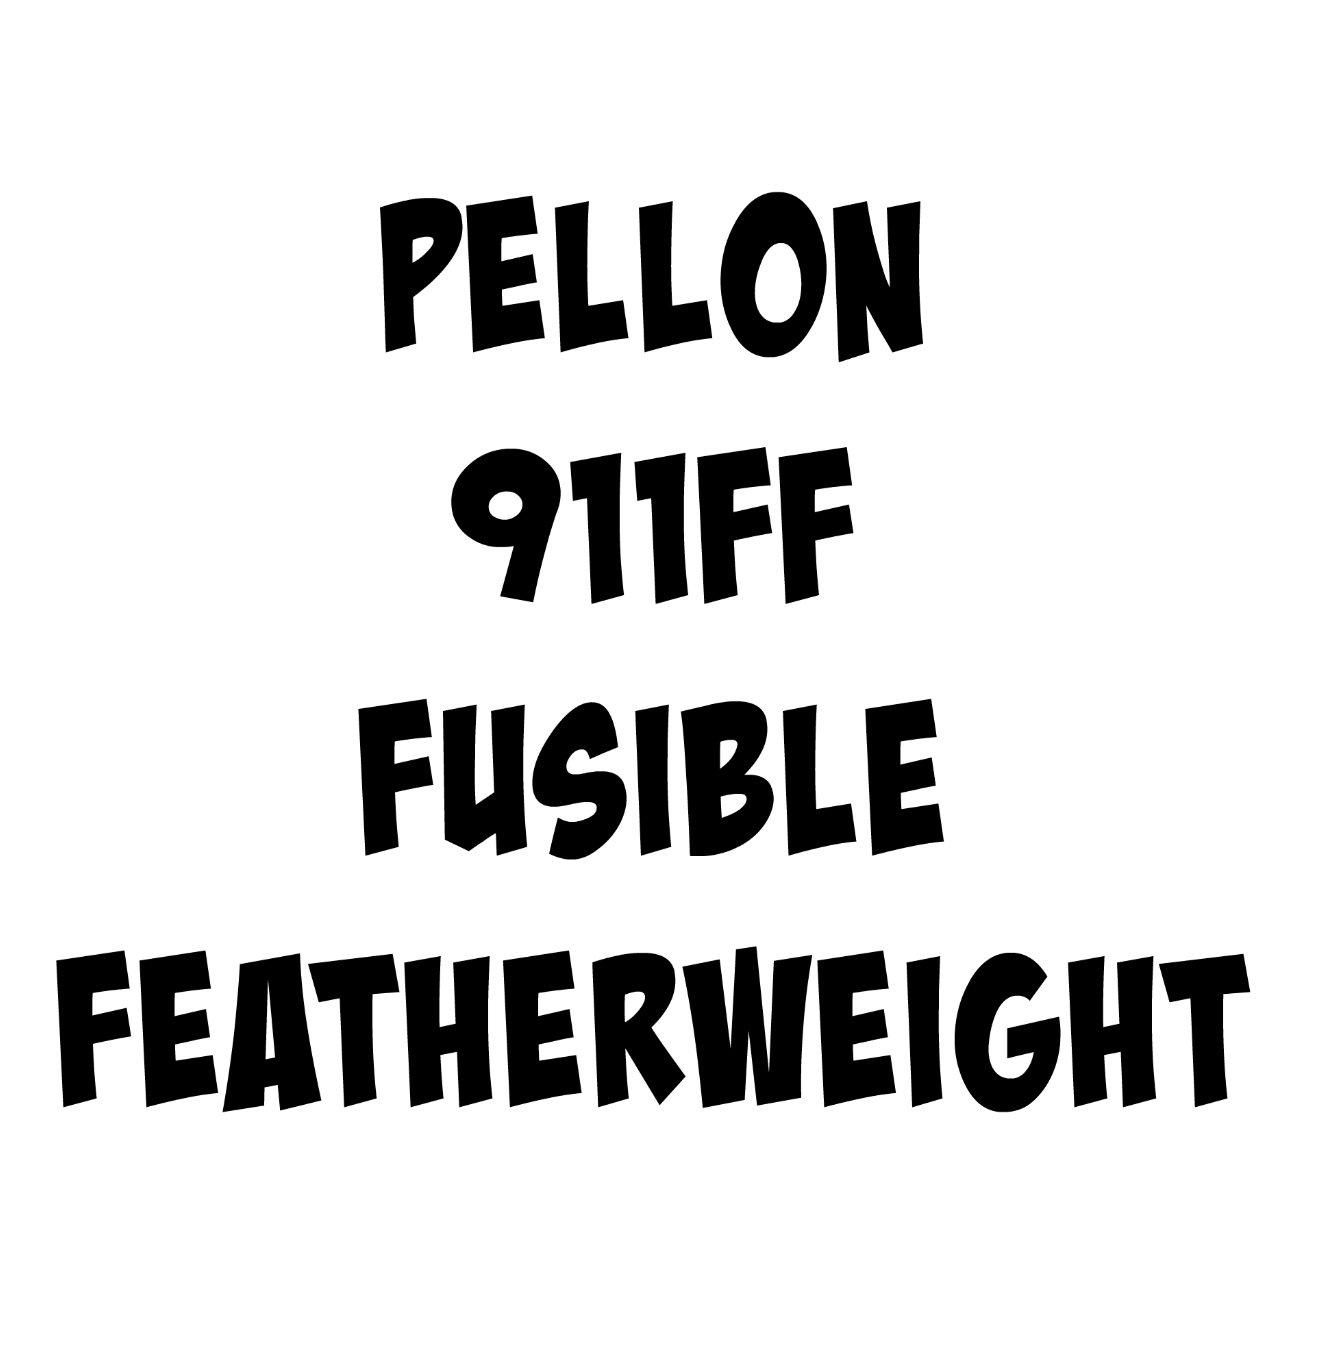 Pellon 911FF Fusible Featherweight  Interfacing